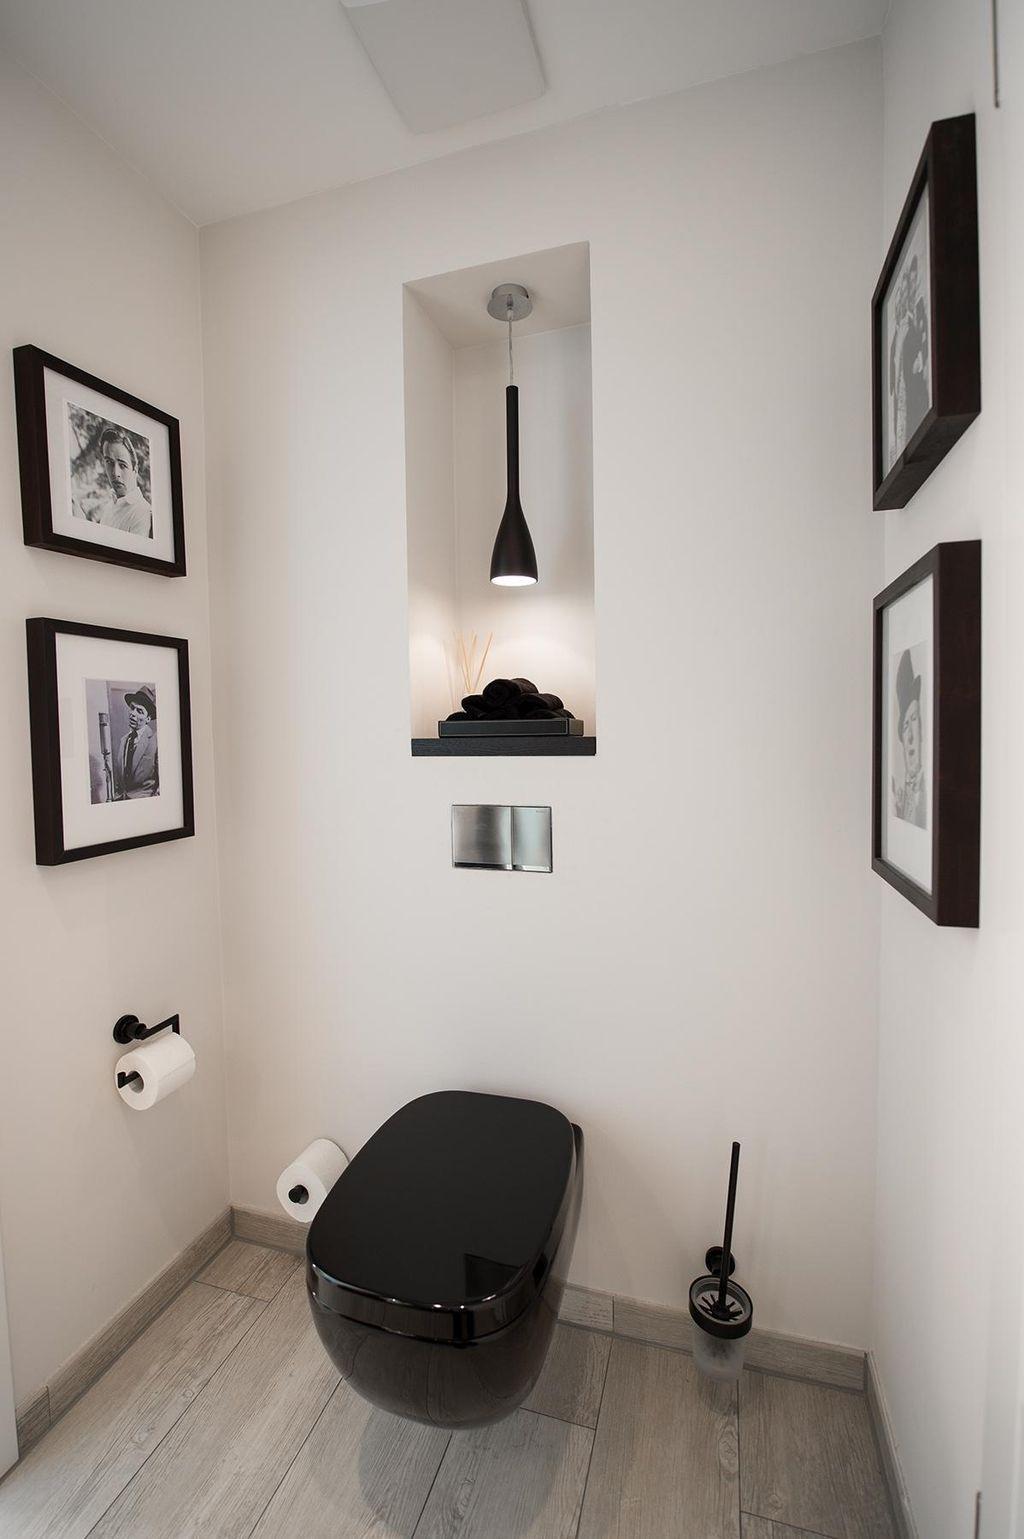 Badezimmer Egal Welche Grosse So Machst Du Es Schon Smalltoiletroom Bestebadstudios Badezimmer Small Bathroom Decor Diy Bathroom Remodel Bathroom Interior